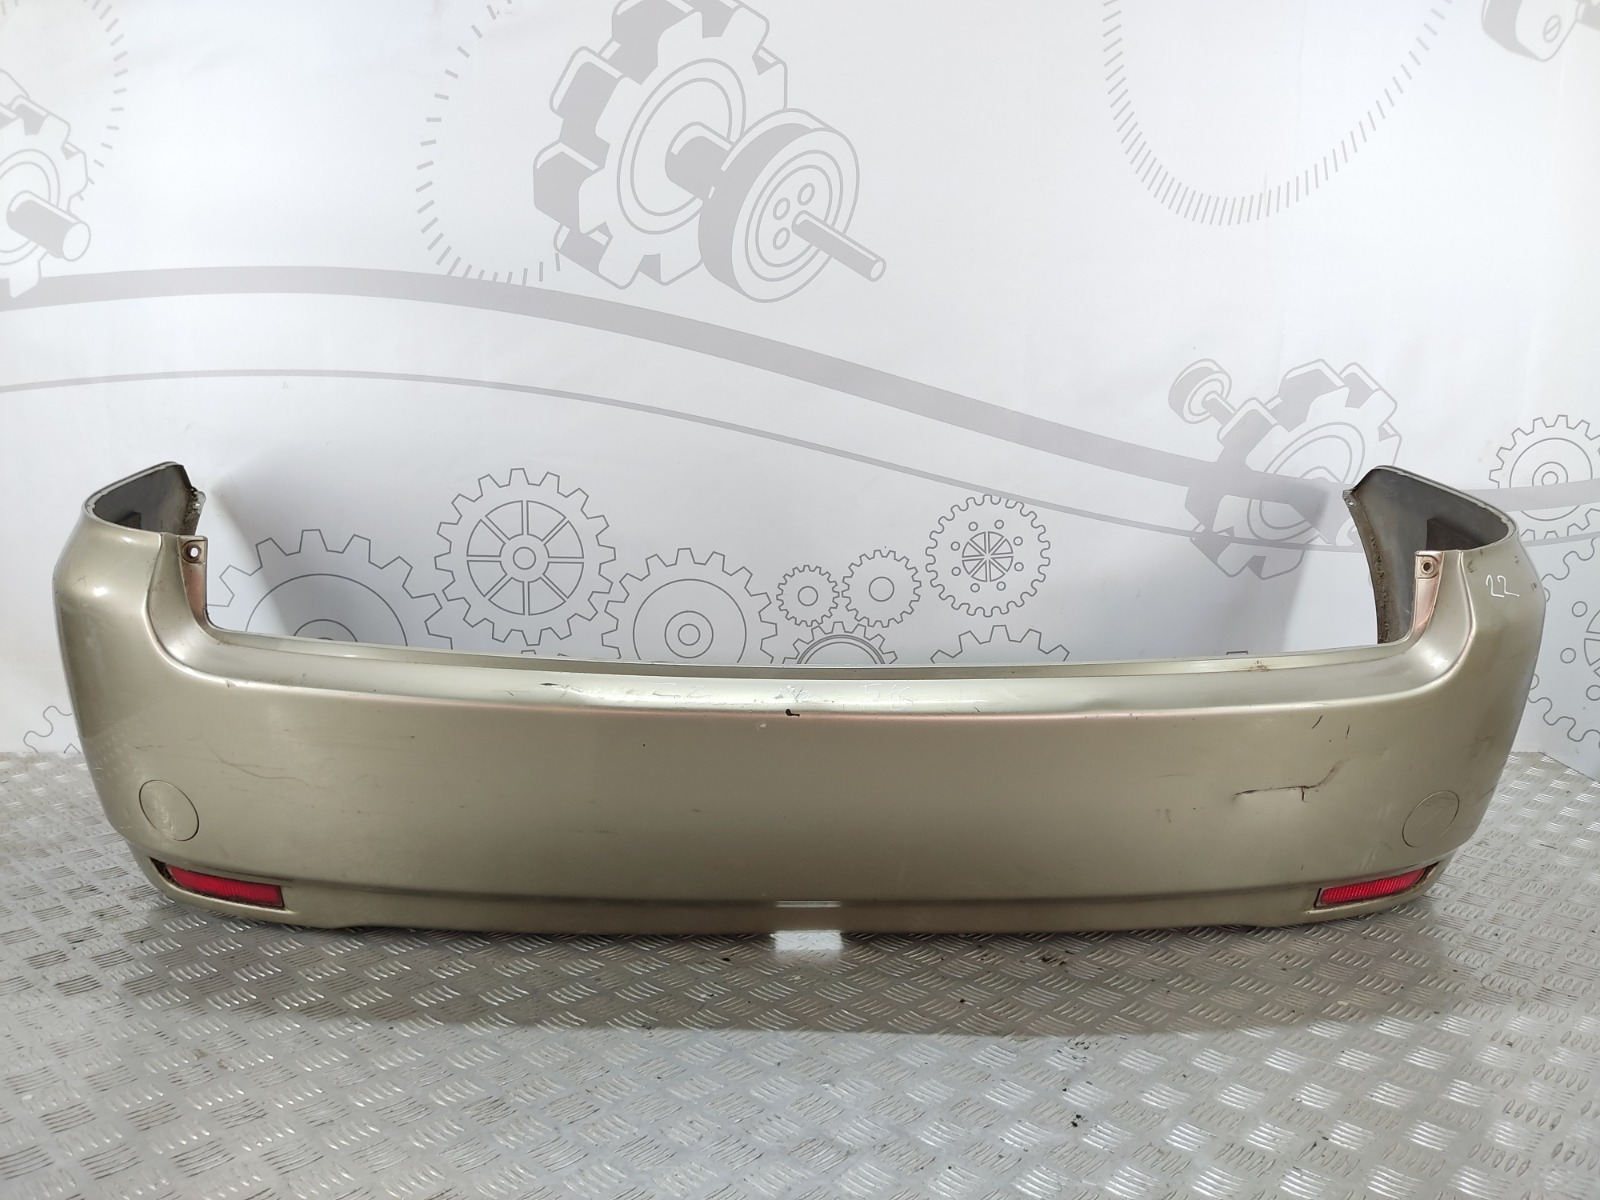 Бампер задний Toyota Avensis Verso 2.0 D-4D 2002 (б/у)